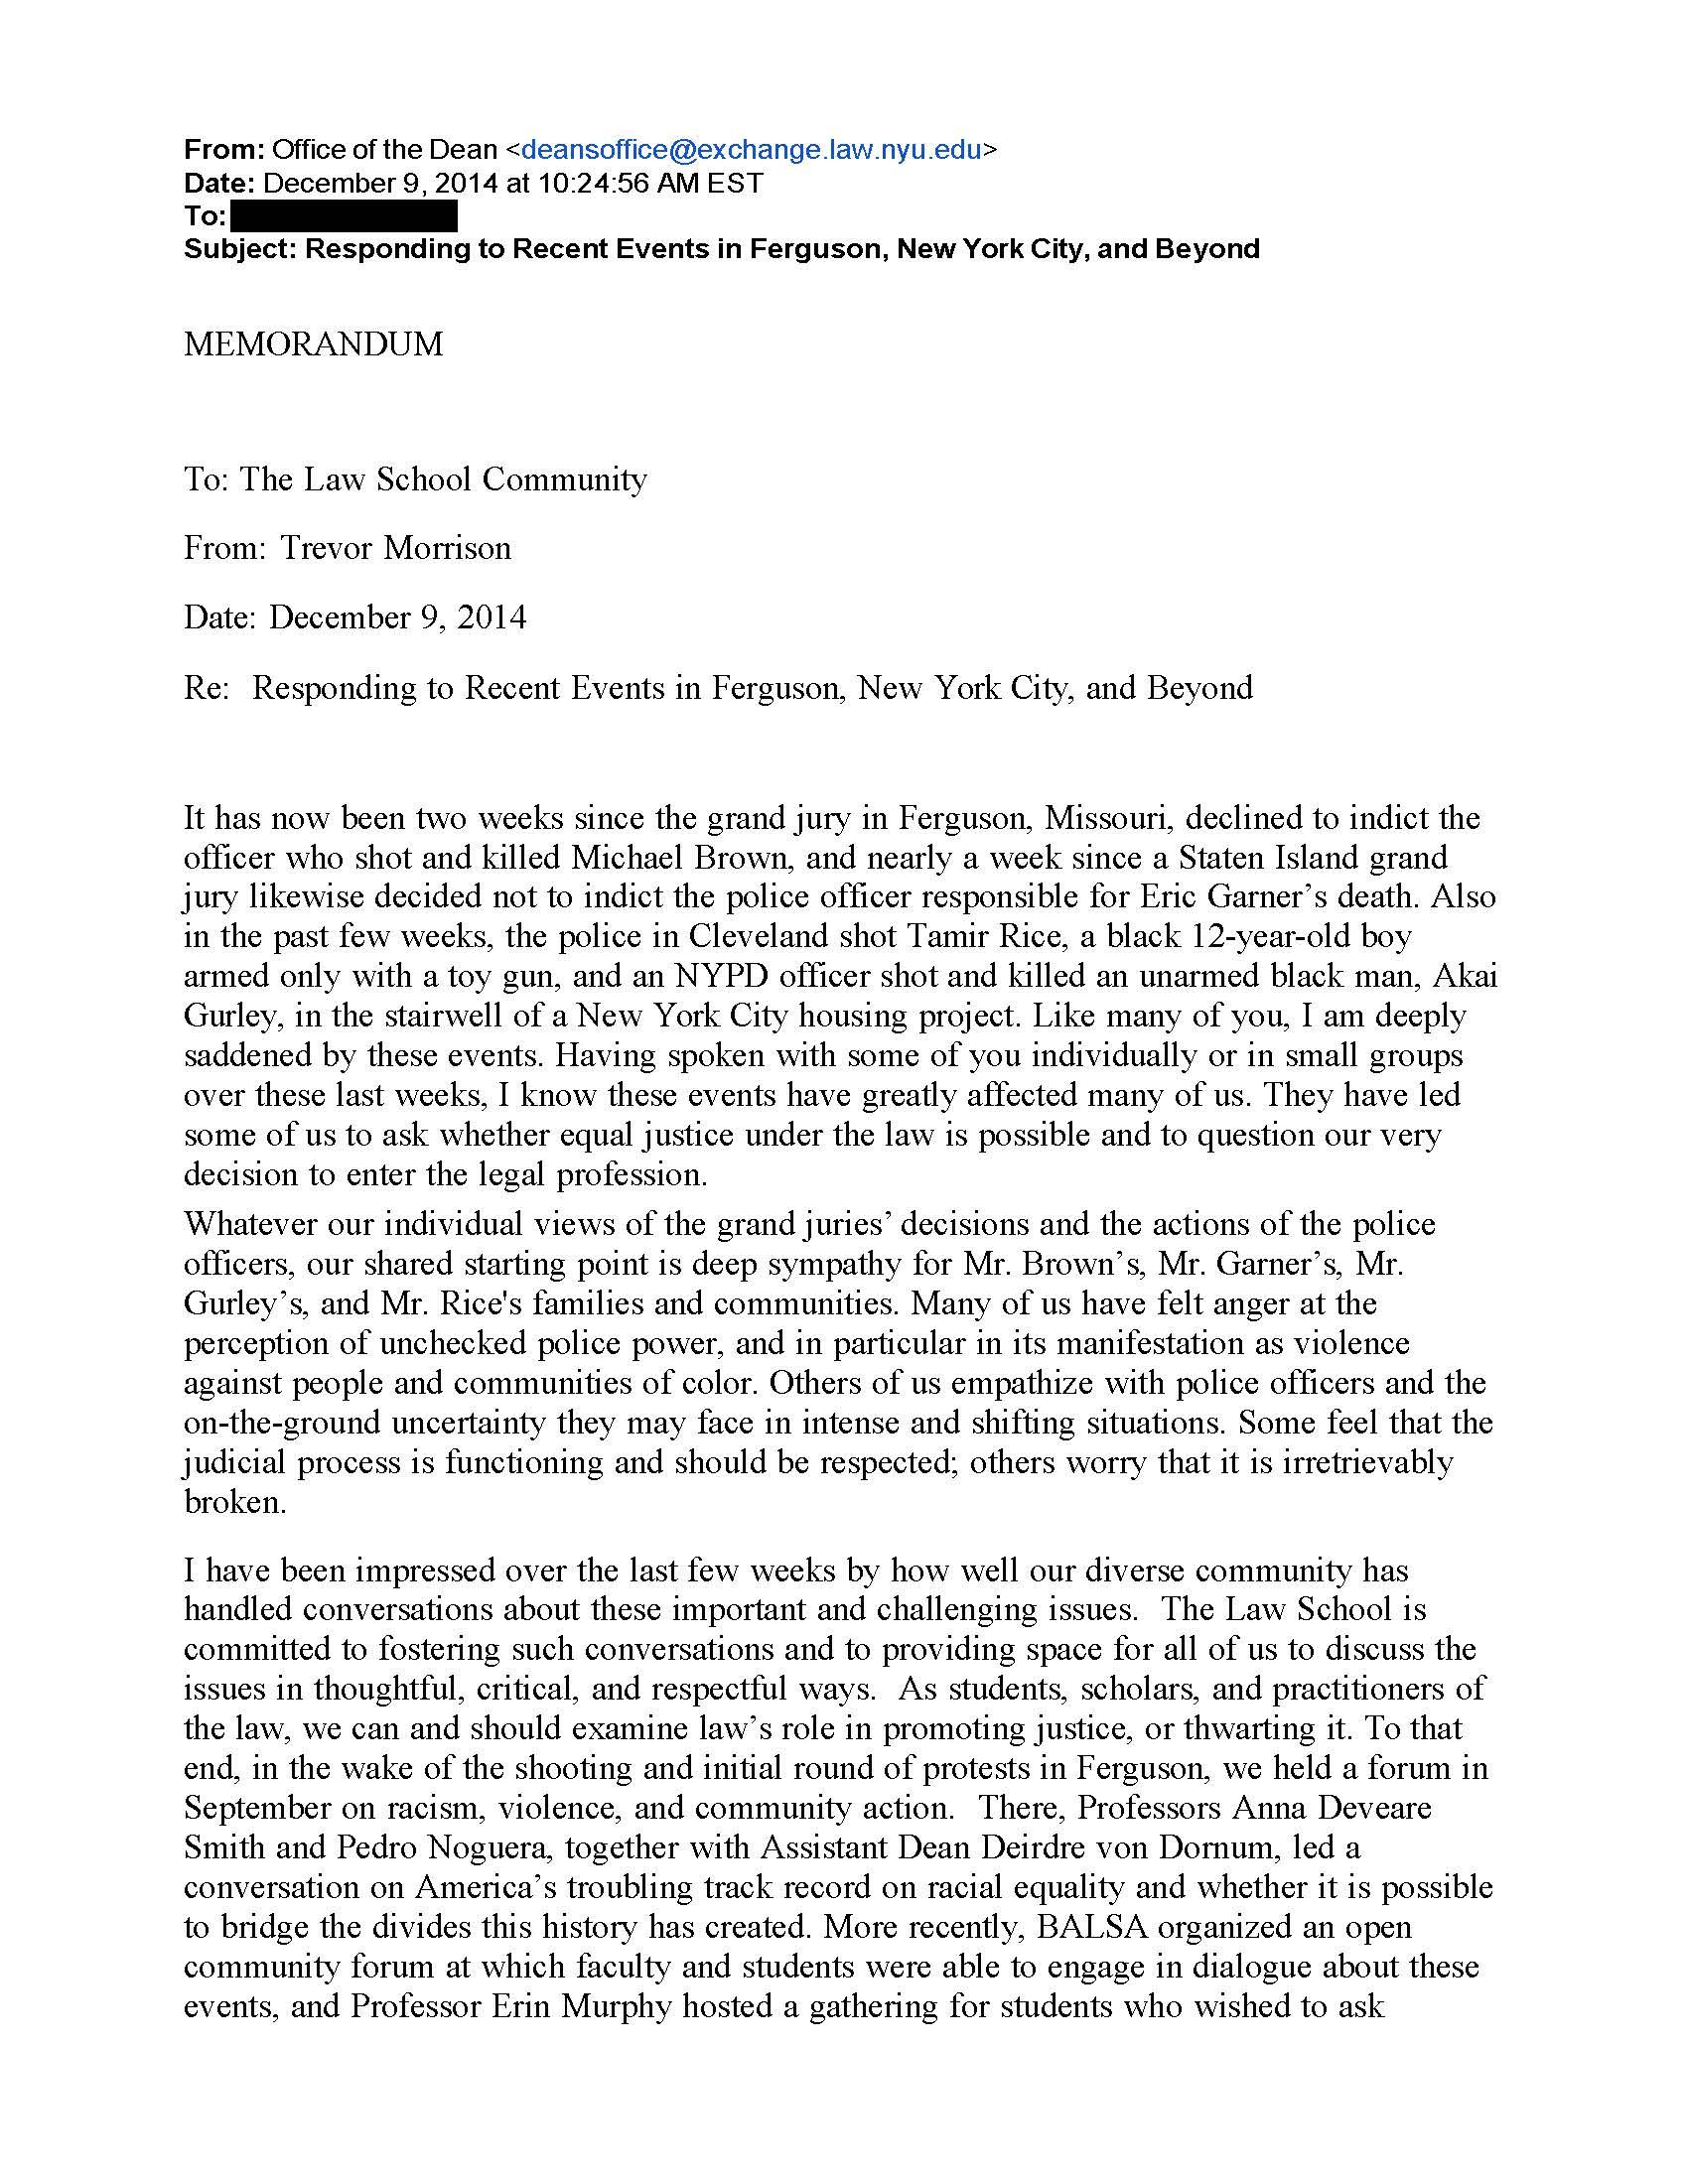 008 Nyu Response 14 Page 1 Essay Example Supplement Wondrous 2017 Full